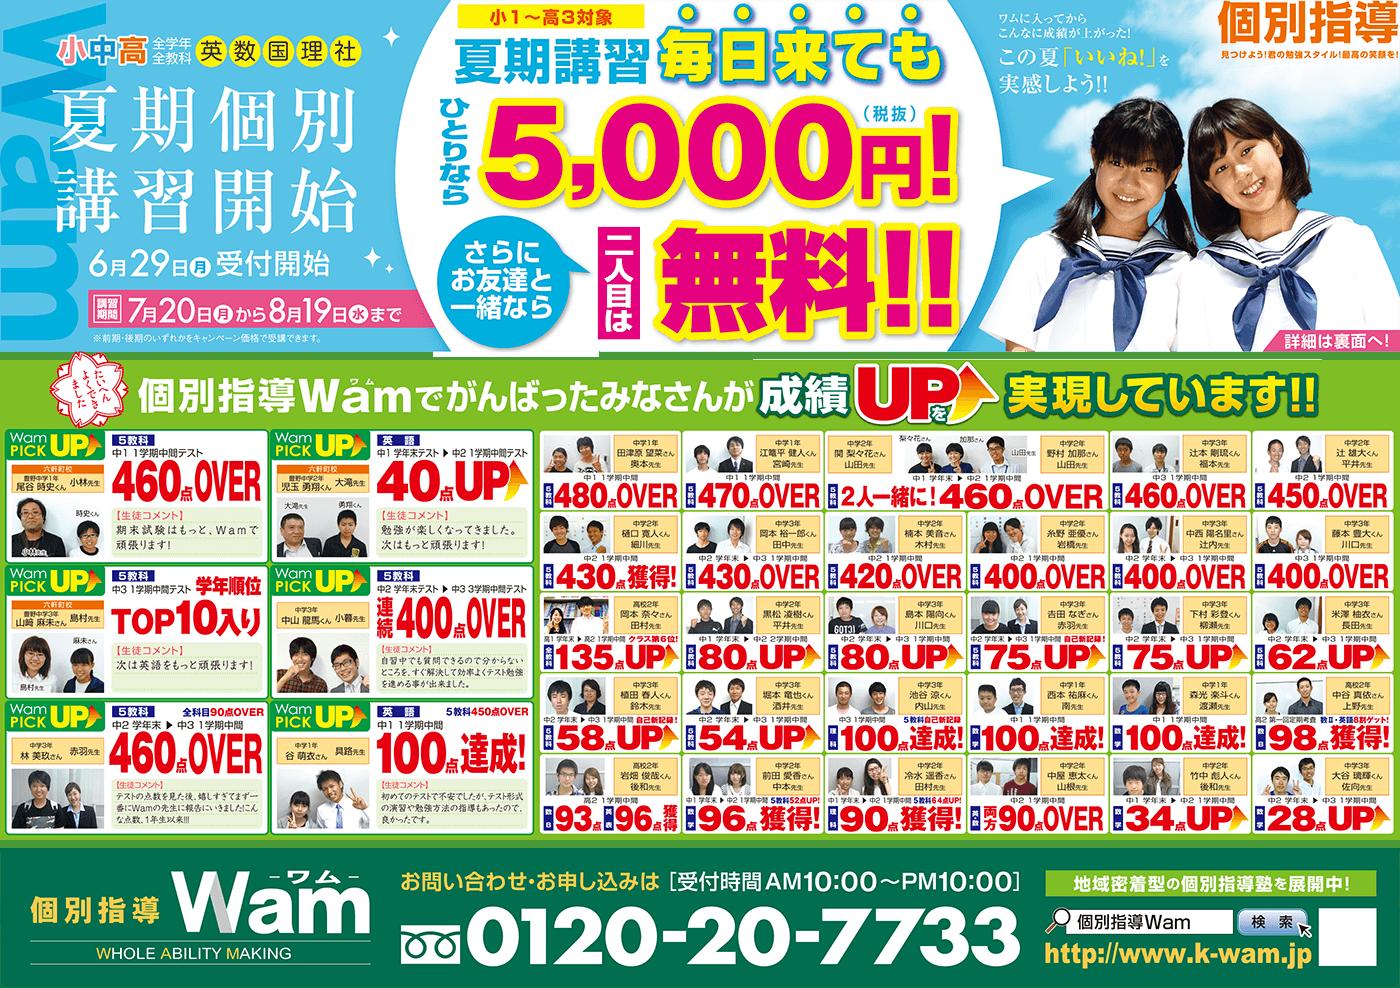 2015年夏期講習 埼玉・オモテ面